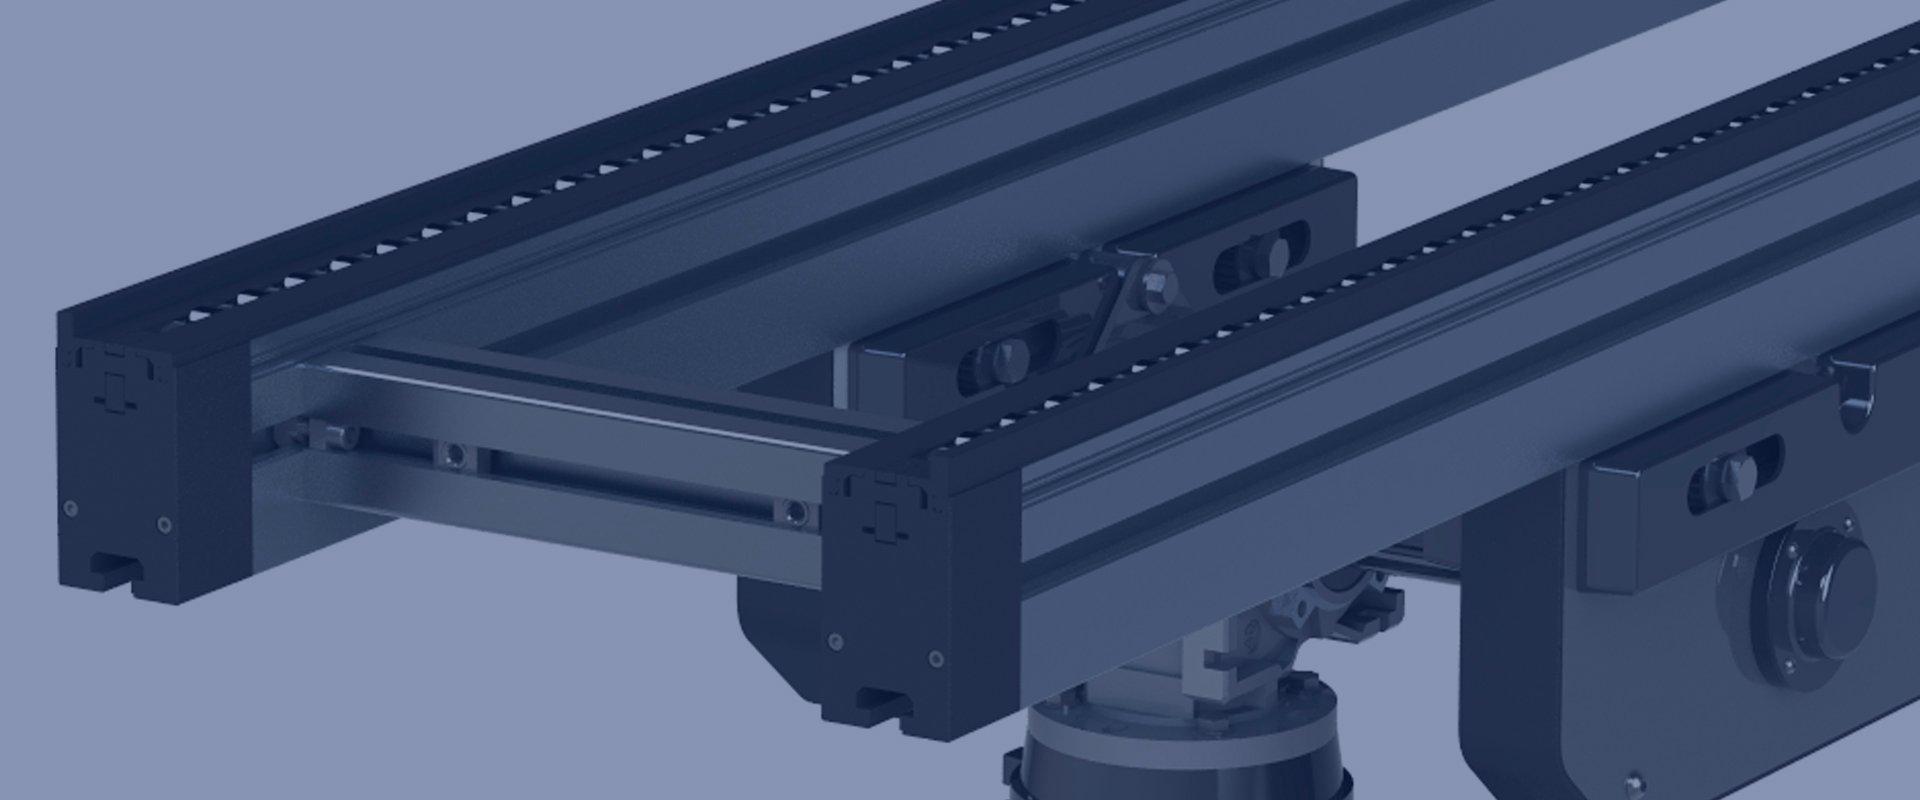 HD Roller Chain Footer BG 2